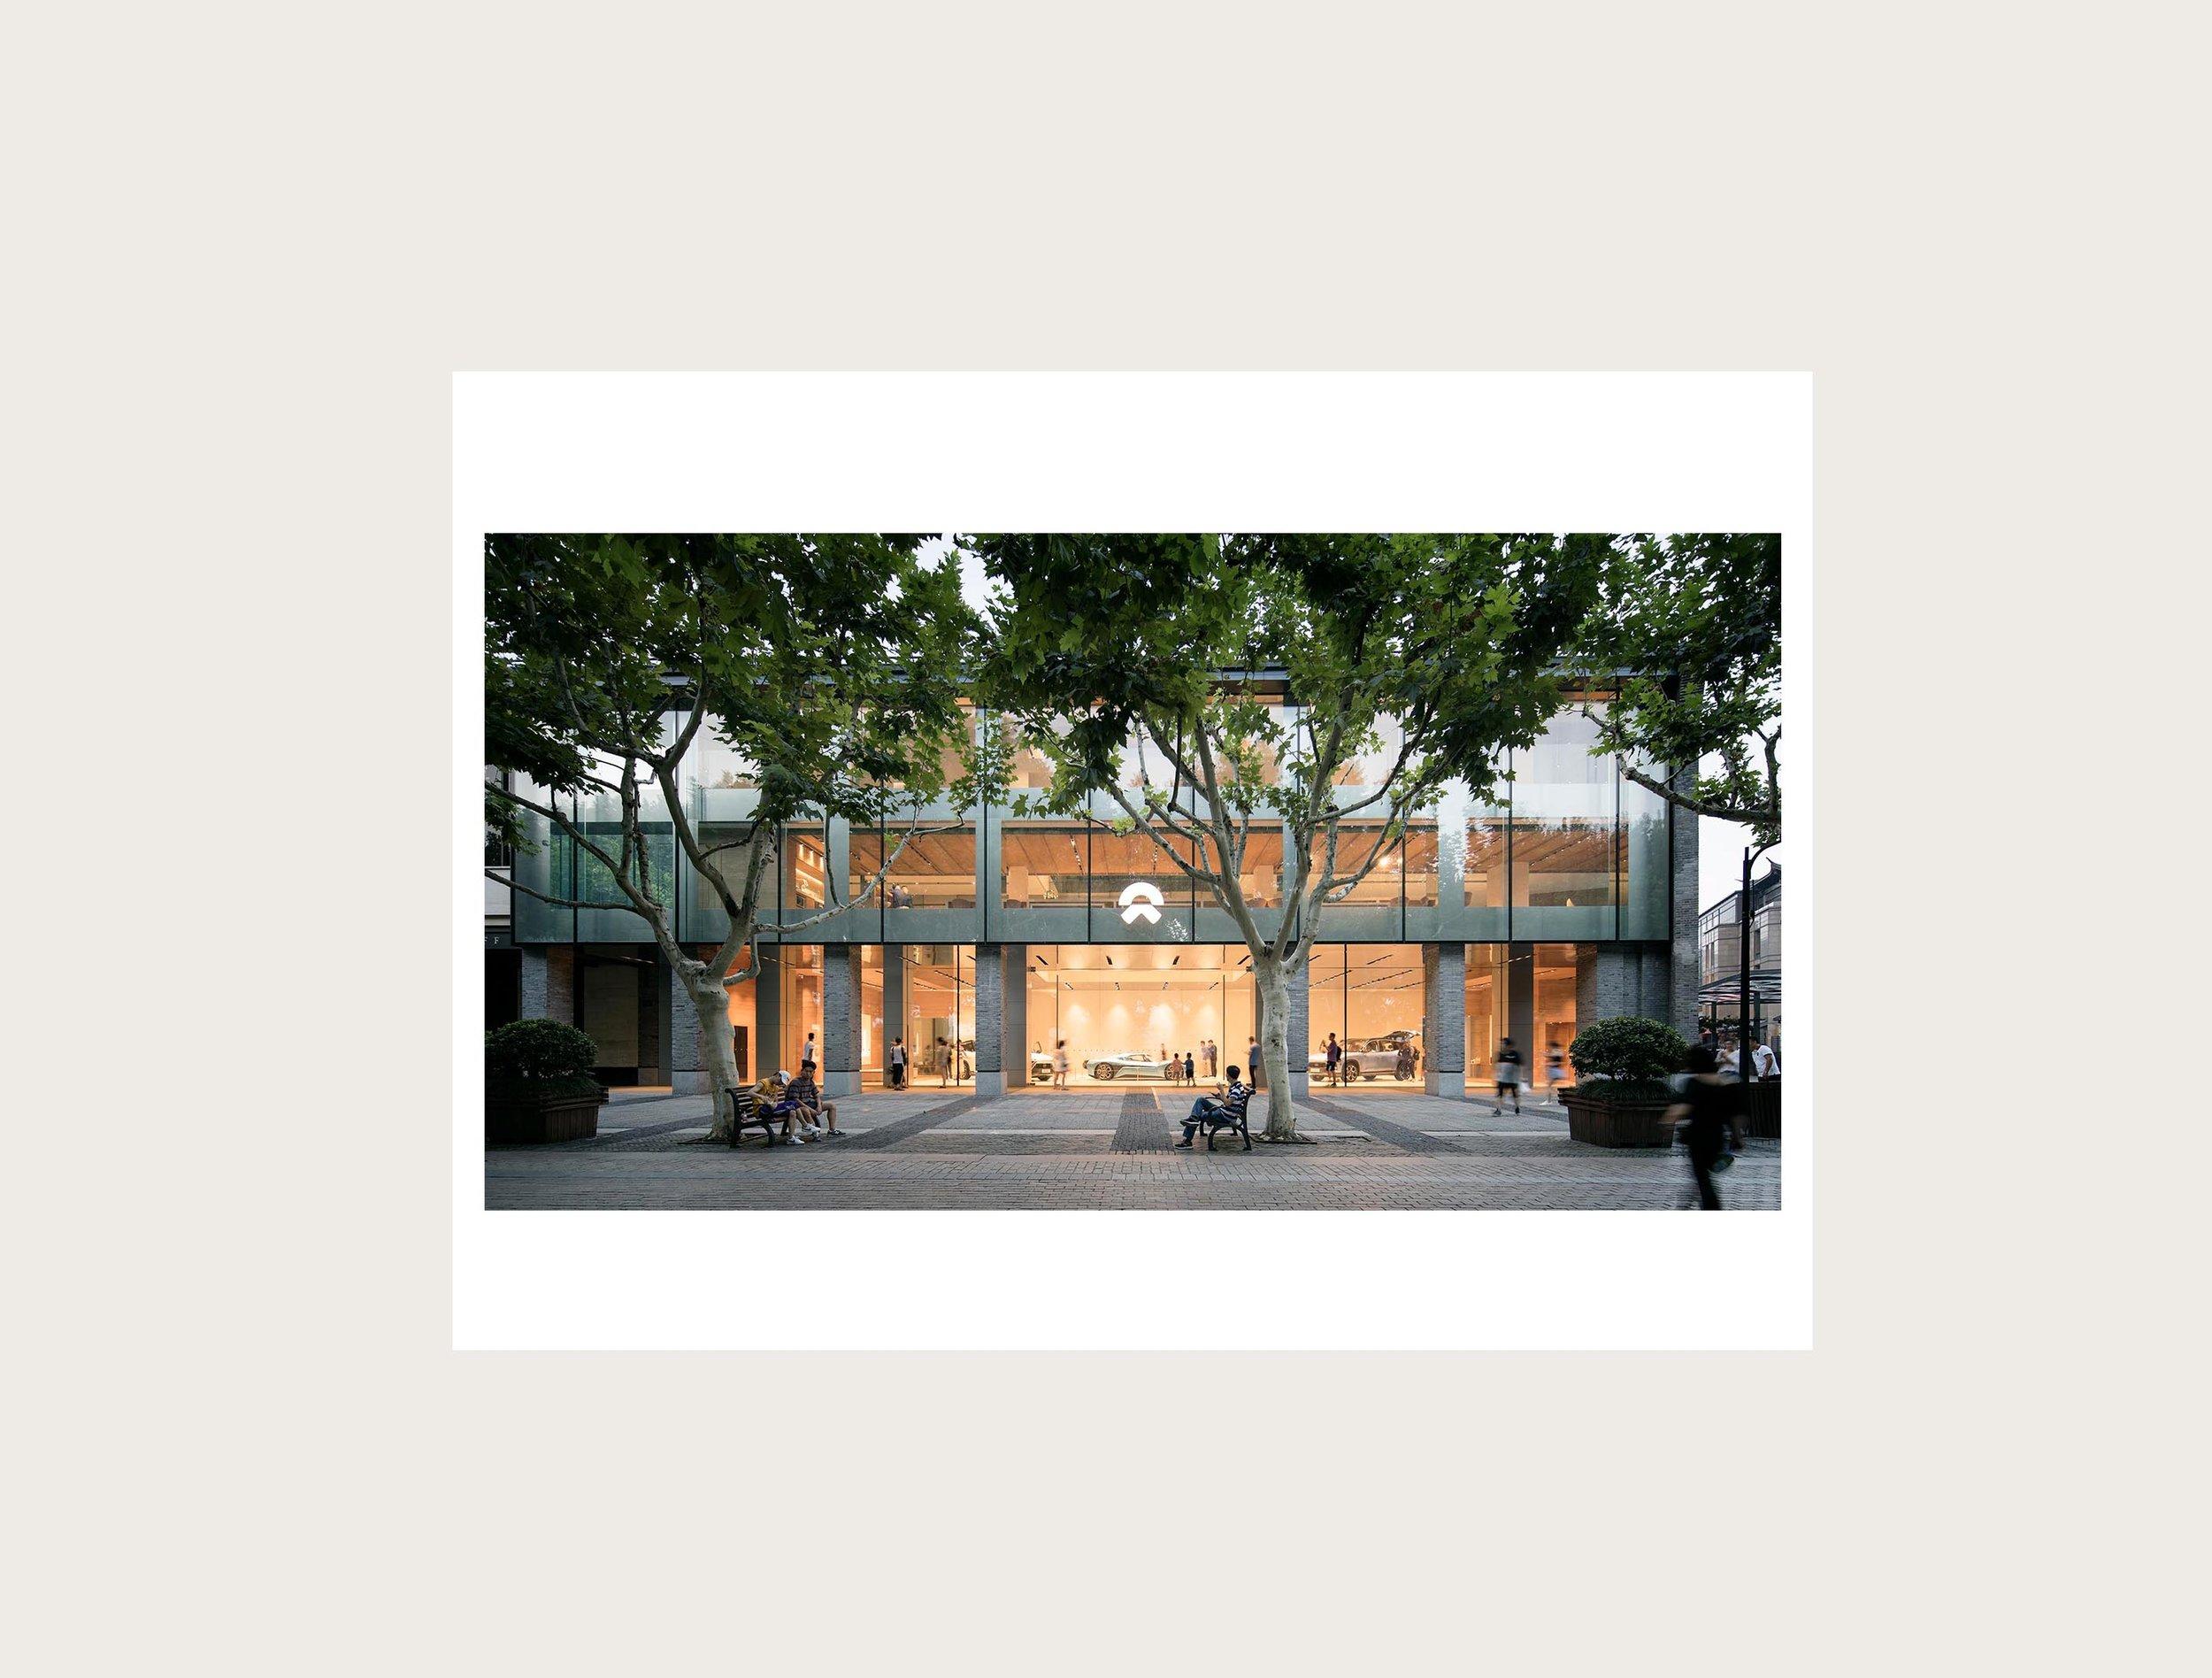 raams-architecture-studio-design-German Roig Garcia-architect-electric-car-coche-electrico-hangzhou-west-lake-nio-house-SHL_NIO-Showroom_@RawVision_02.jpg